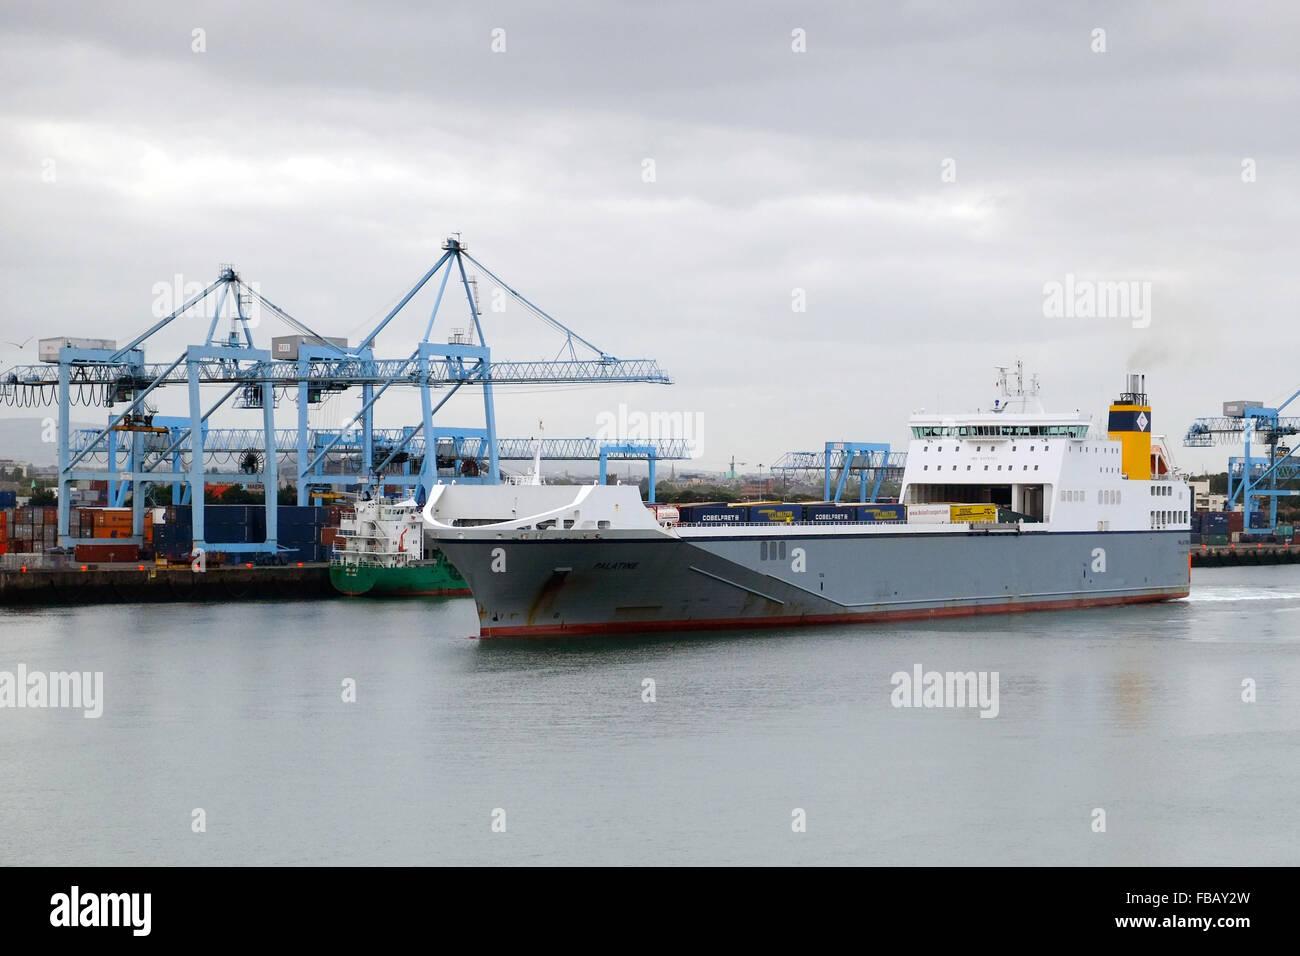 Palatine Ro-Ro cargo ship leaving Dublin Port, Ireland, on September 25th 2015. - Stock Image